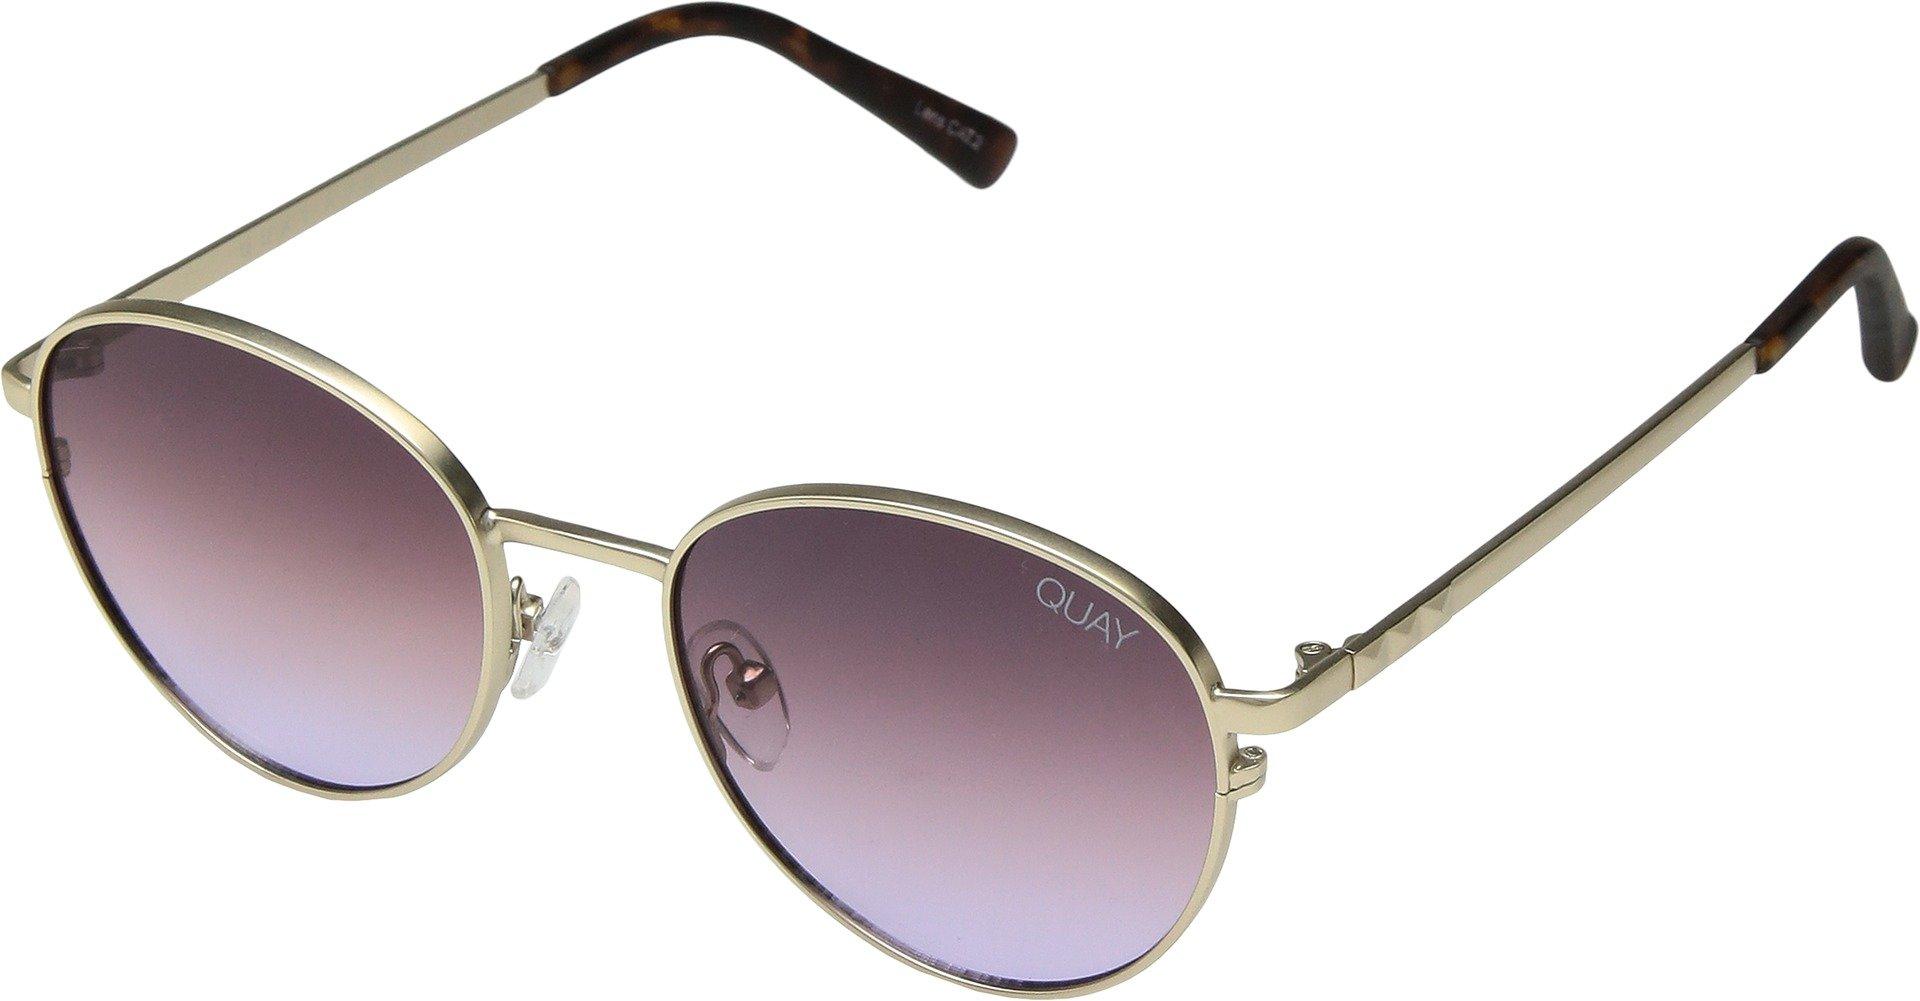 Quay Women's Crazy Love Sunglasses, Gold/Purple, One Size